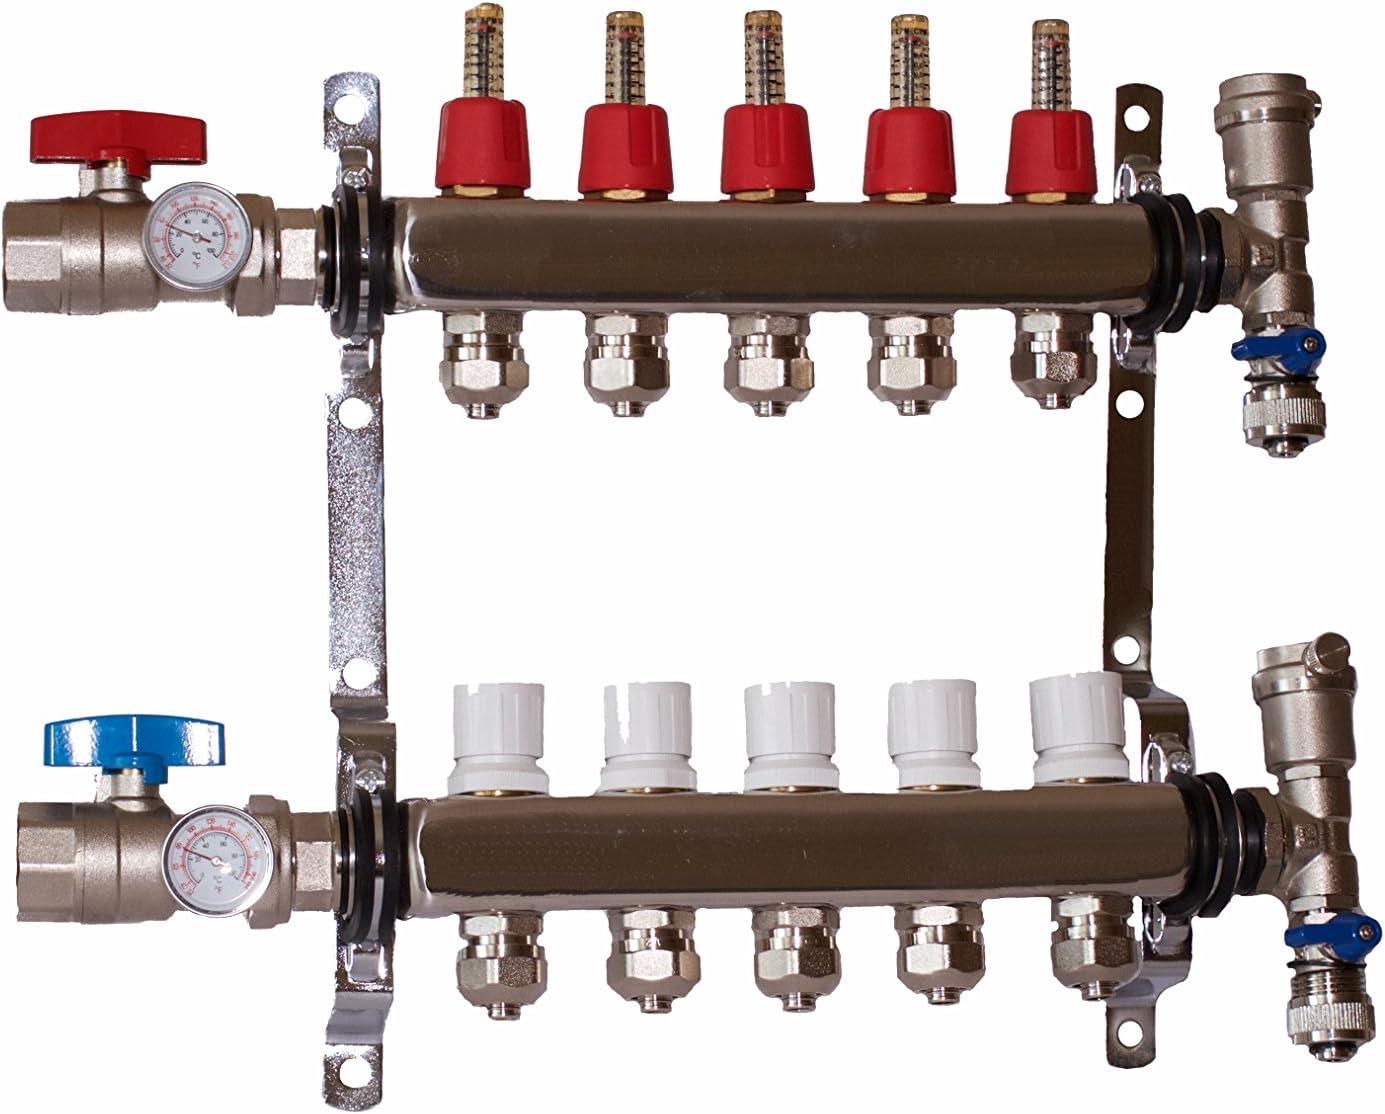 "10 Branch PEX Radiant Floor Heating Manifold Set for 1//2"" PEX"